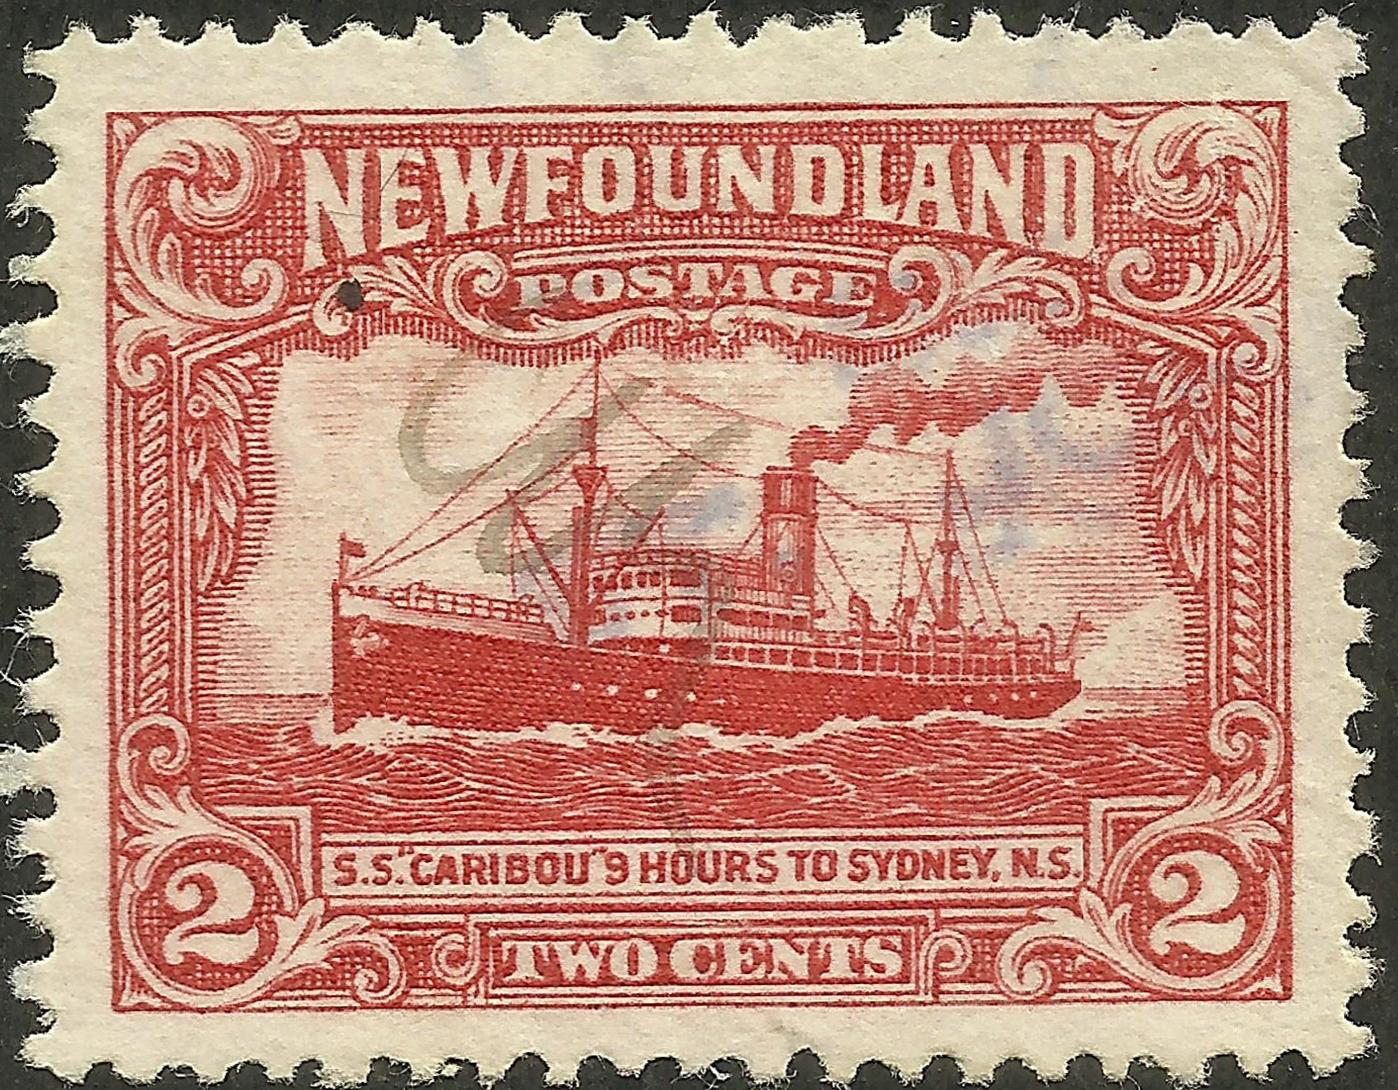 Newfoundland - Scott #164 (1929)